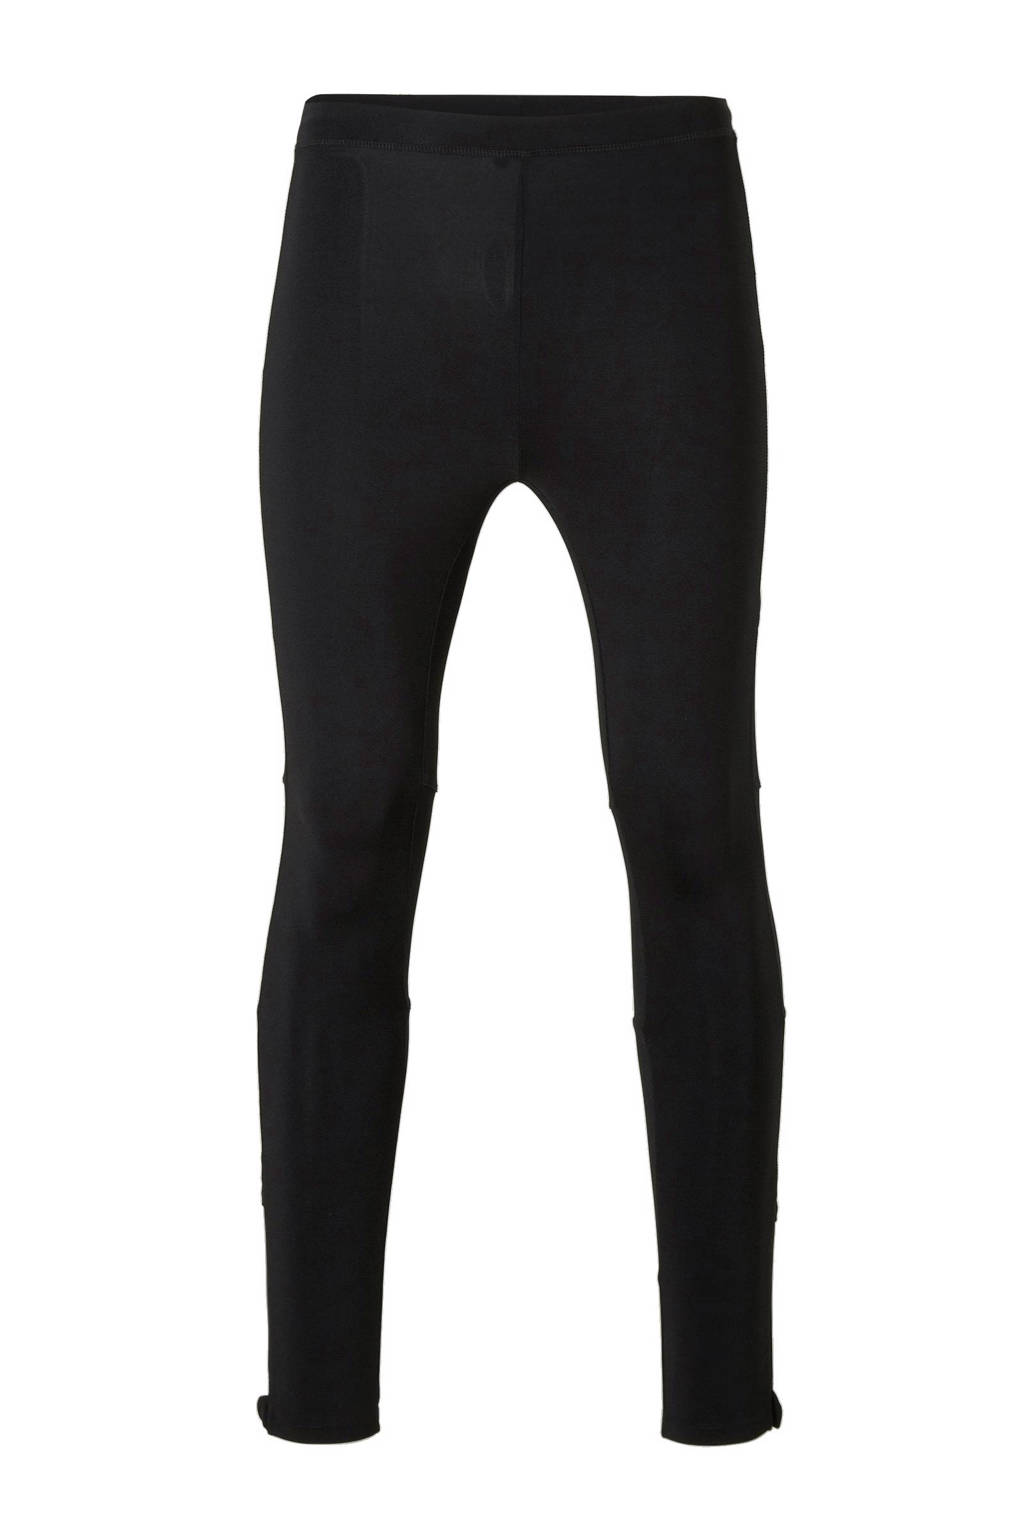 Donnay   hardloopbroek zwart, Zwart